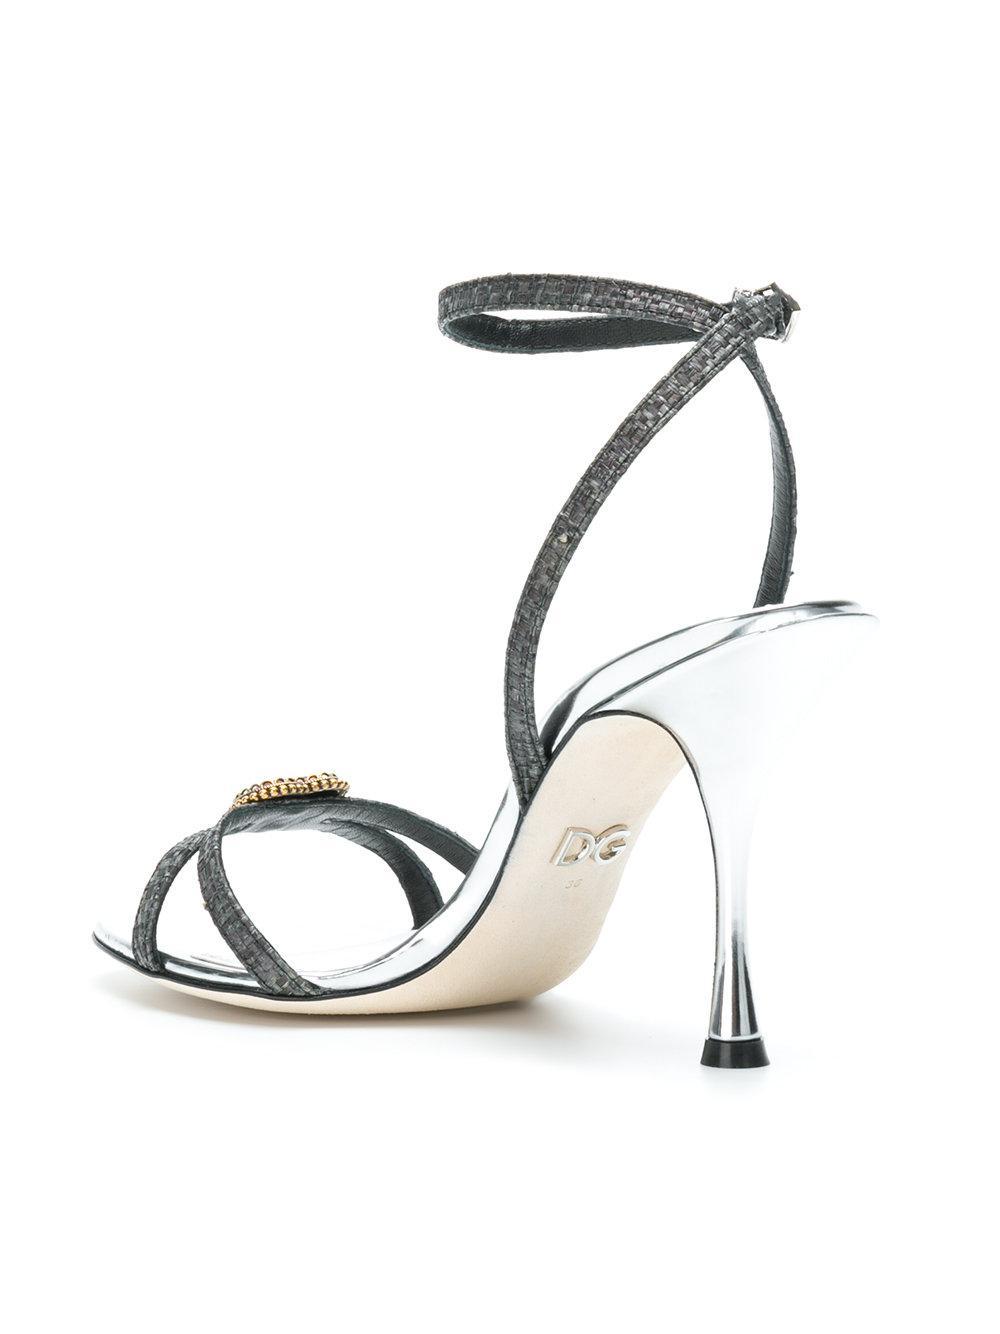 Sandales Embelli Coeur - Gris Dolce & Gabbana Sortie D'usine 2018 Prix Pas Cher Style De Mode De Sortie Mastercard BddDuTkbo